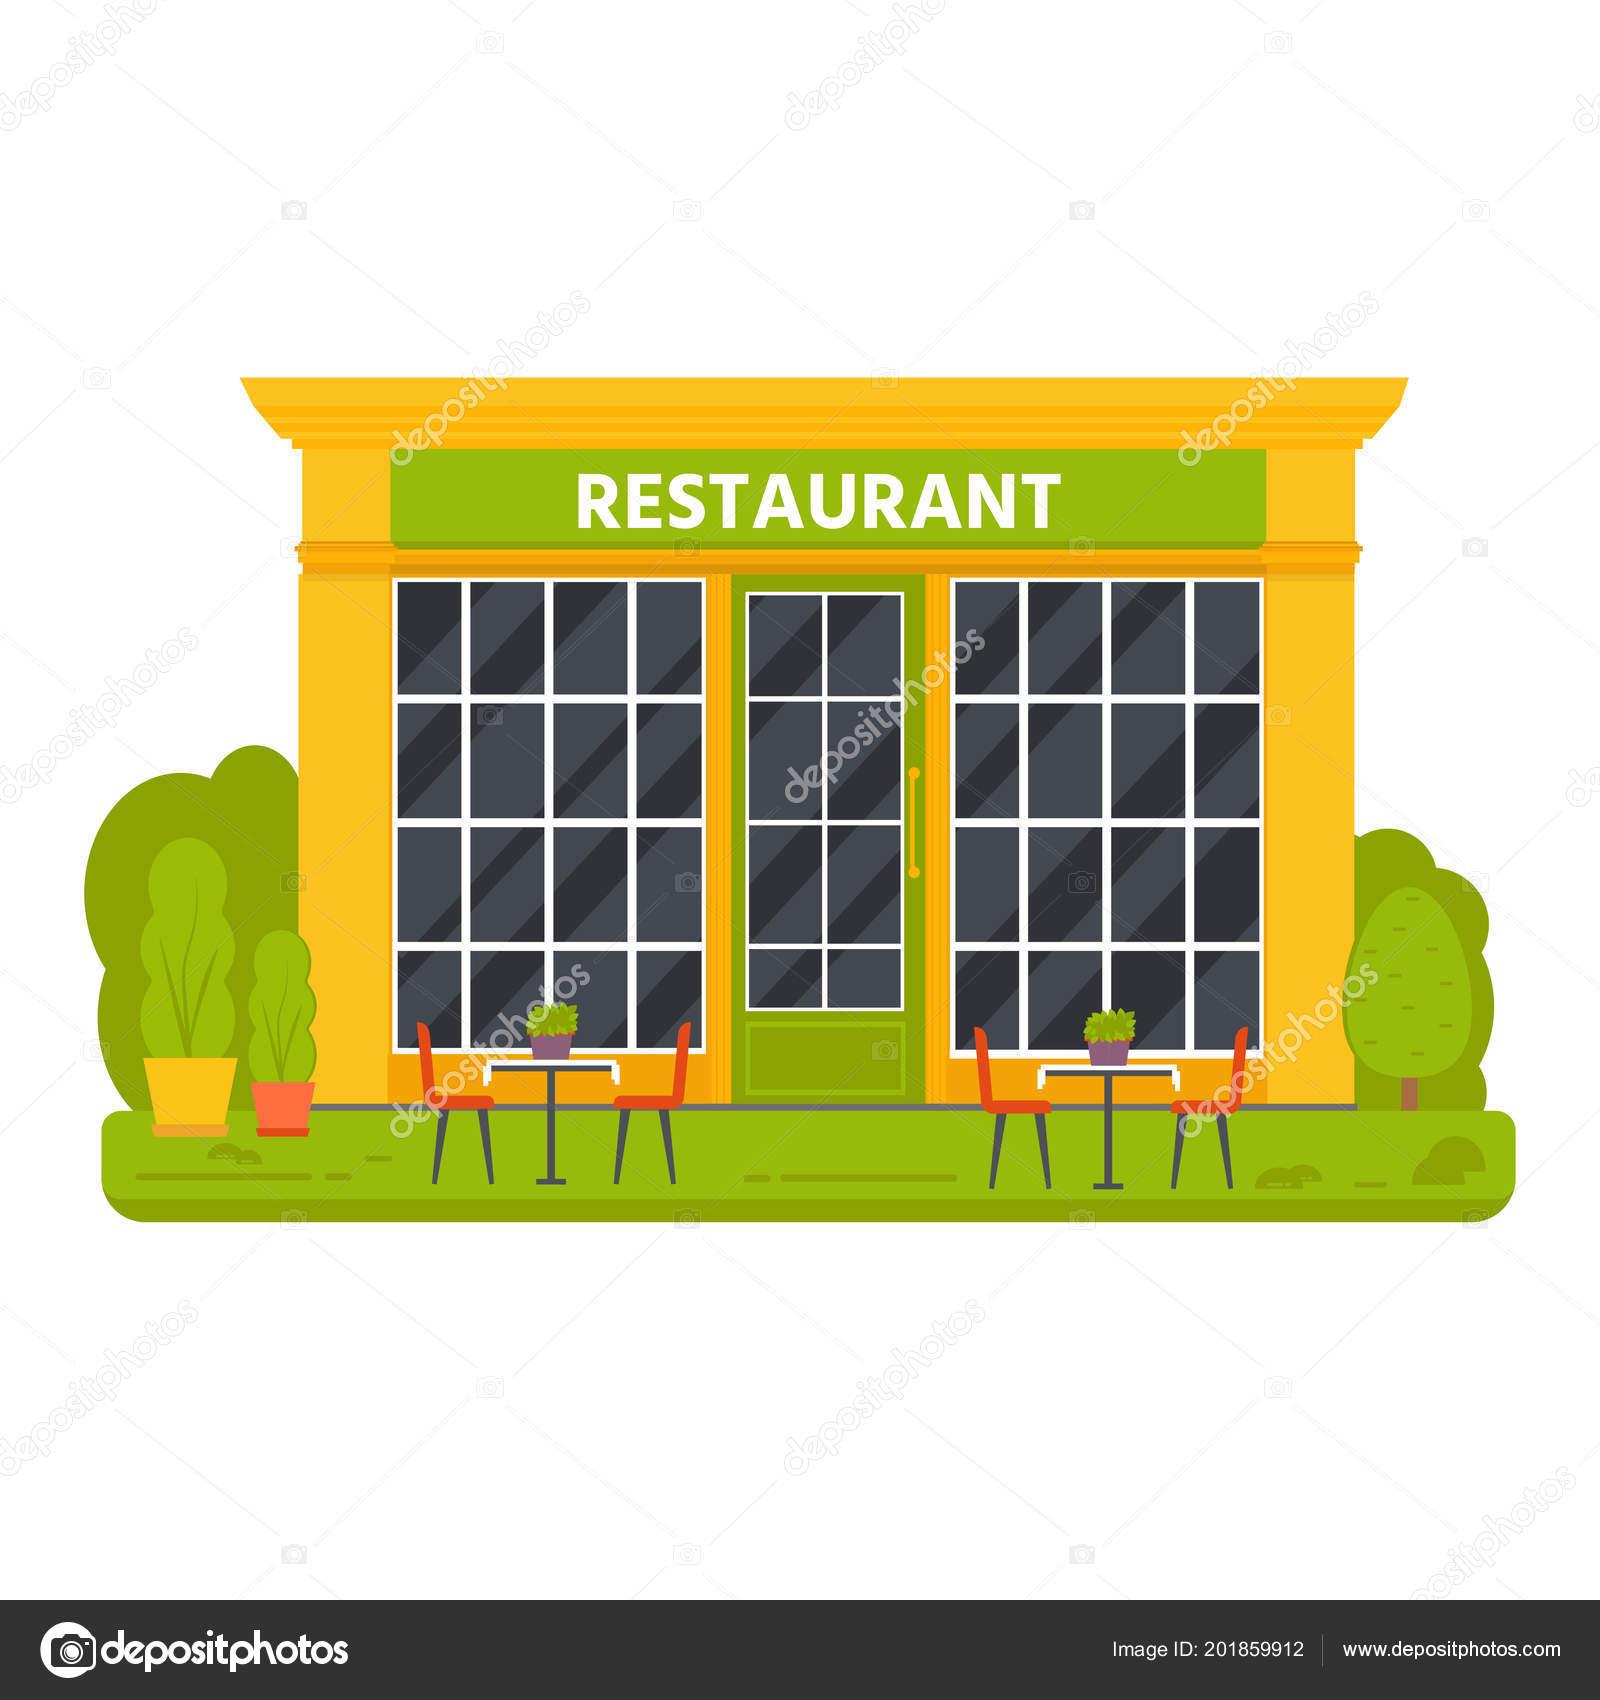 Small Restaurant Exterior Design Vector Flat Design Restaurant Exterior Shop Facade Store Front Window Stock Vector C Tanyasun 201859912